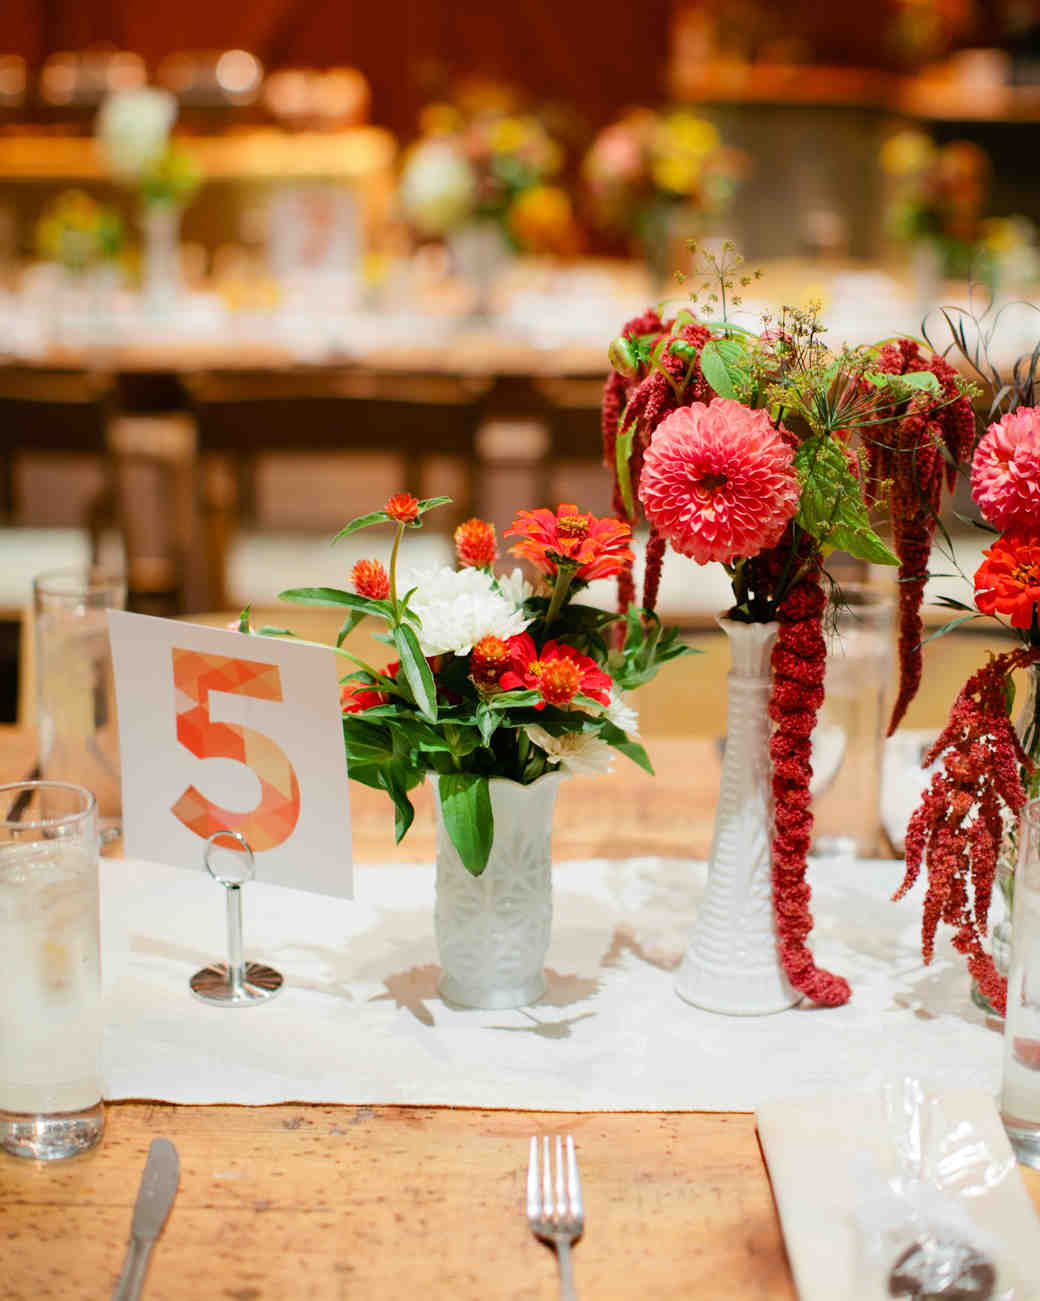 jess-steve-wedding-table-69-s112362-1115.jpg